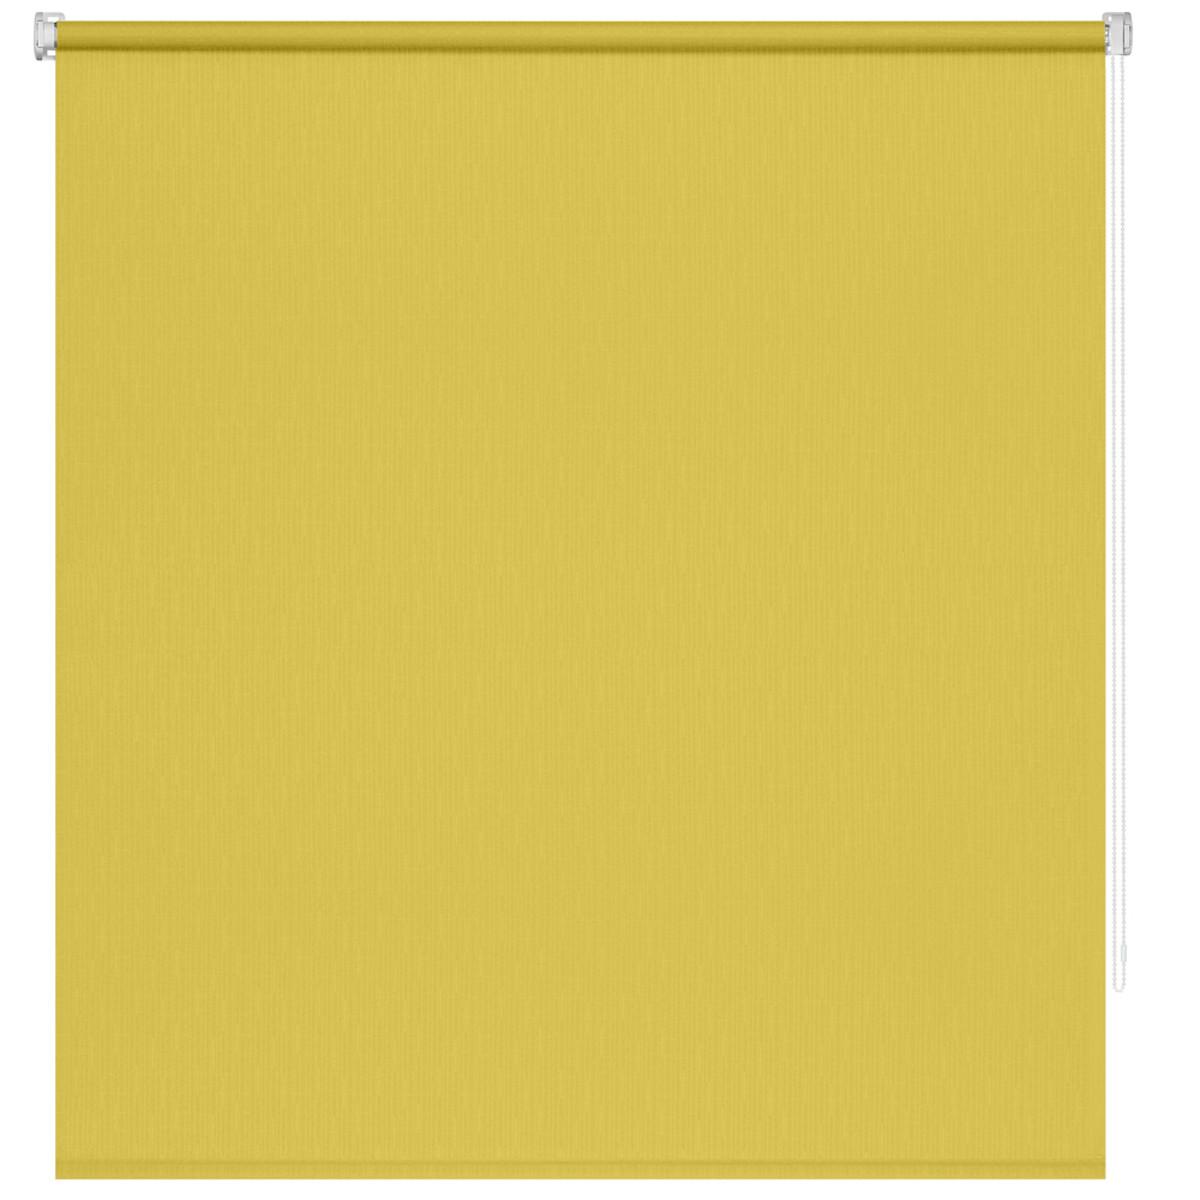 Рулонная Ора Decofest Апилера 80Х160 Цвет Желтый